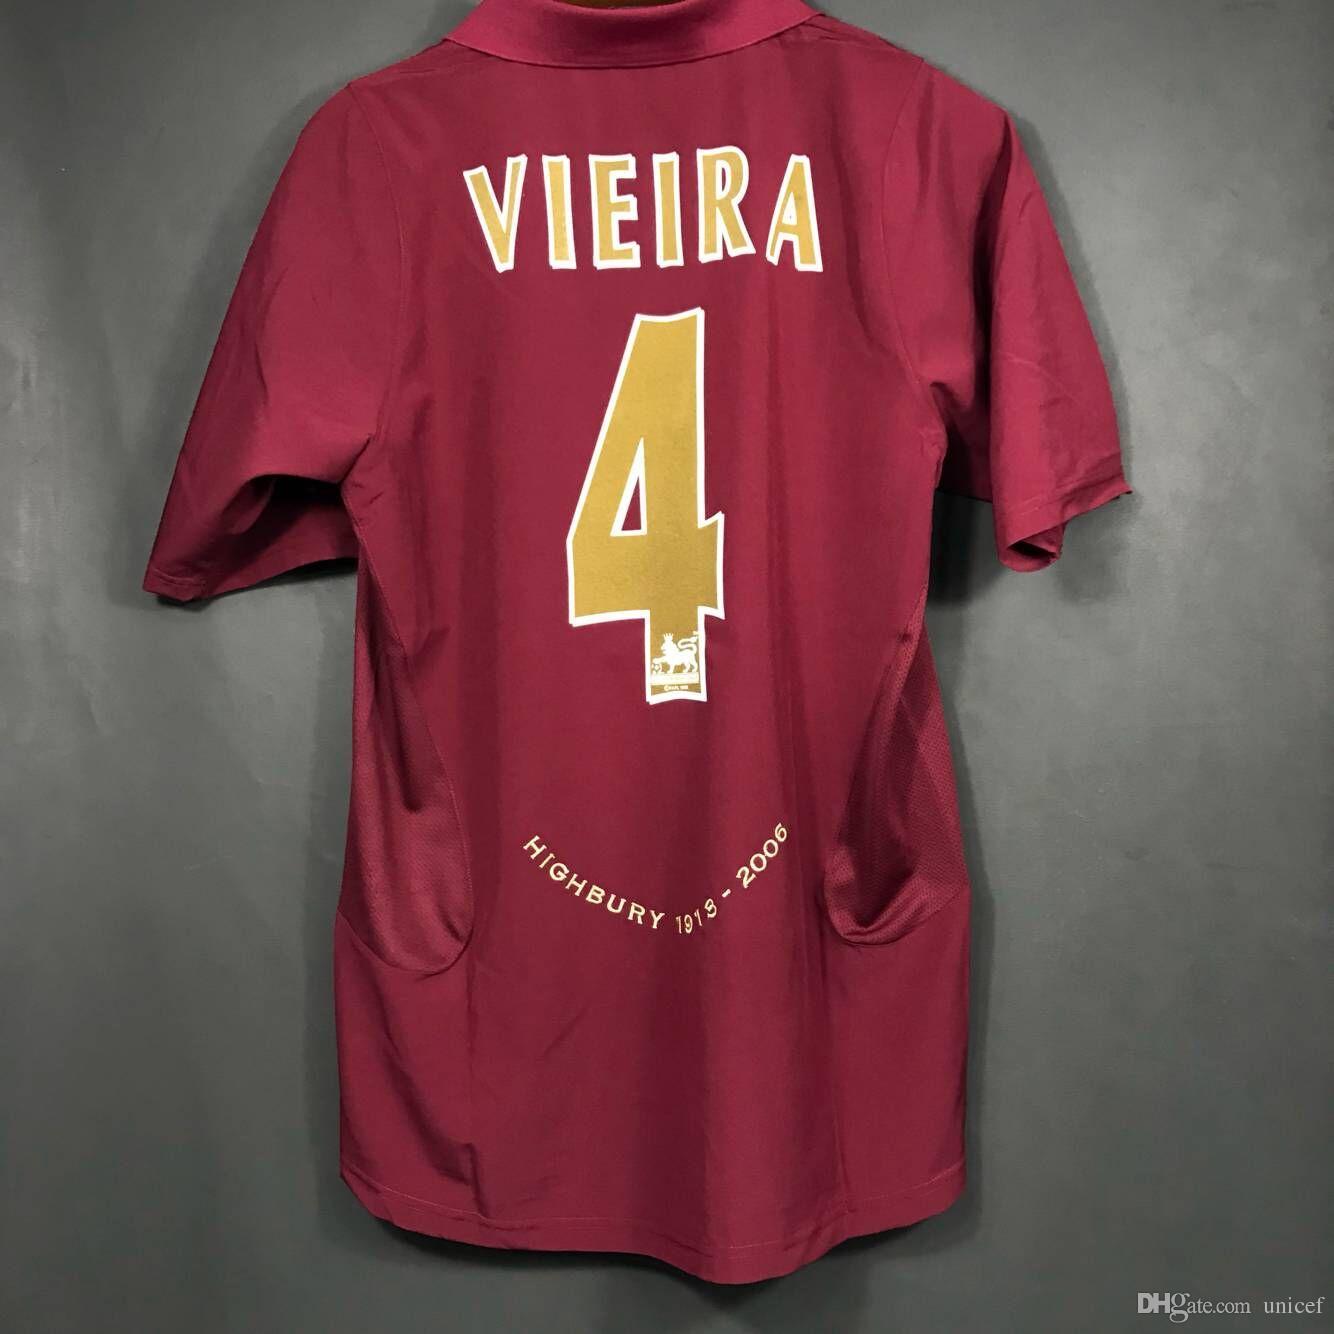 timeless design f6eac 59870 Maglia 2005 2006 Gunner Retro Soccer Jerseys Highbury 05-06 Patrick Vieira  Football Shirts Maroon Wine Flocked Name and number